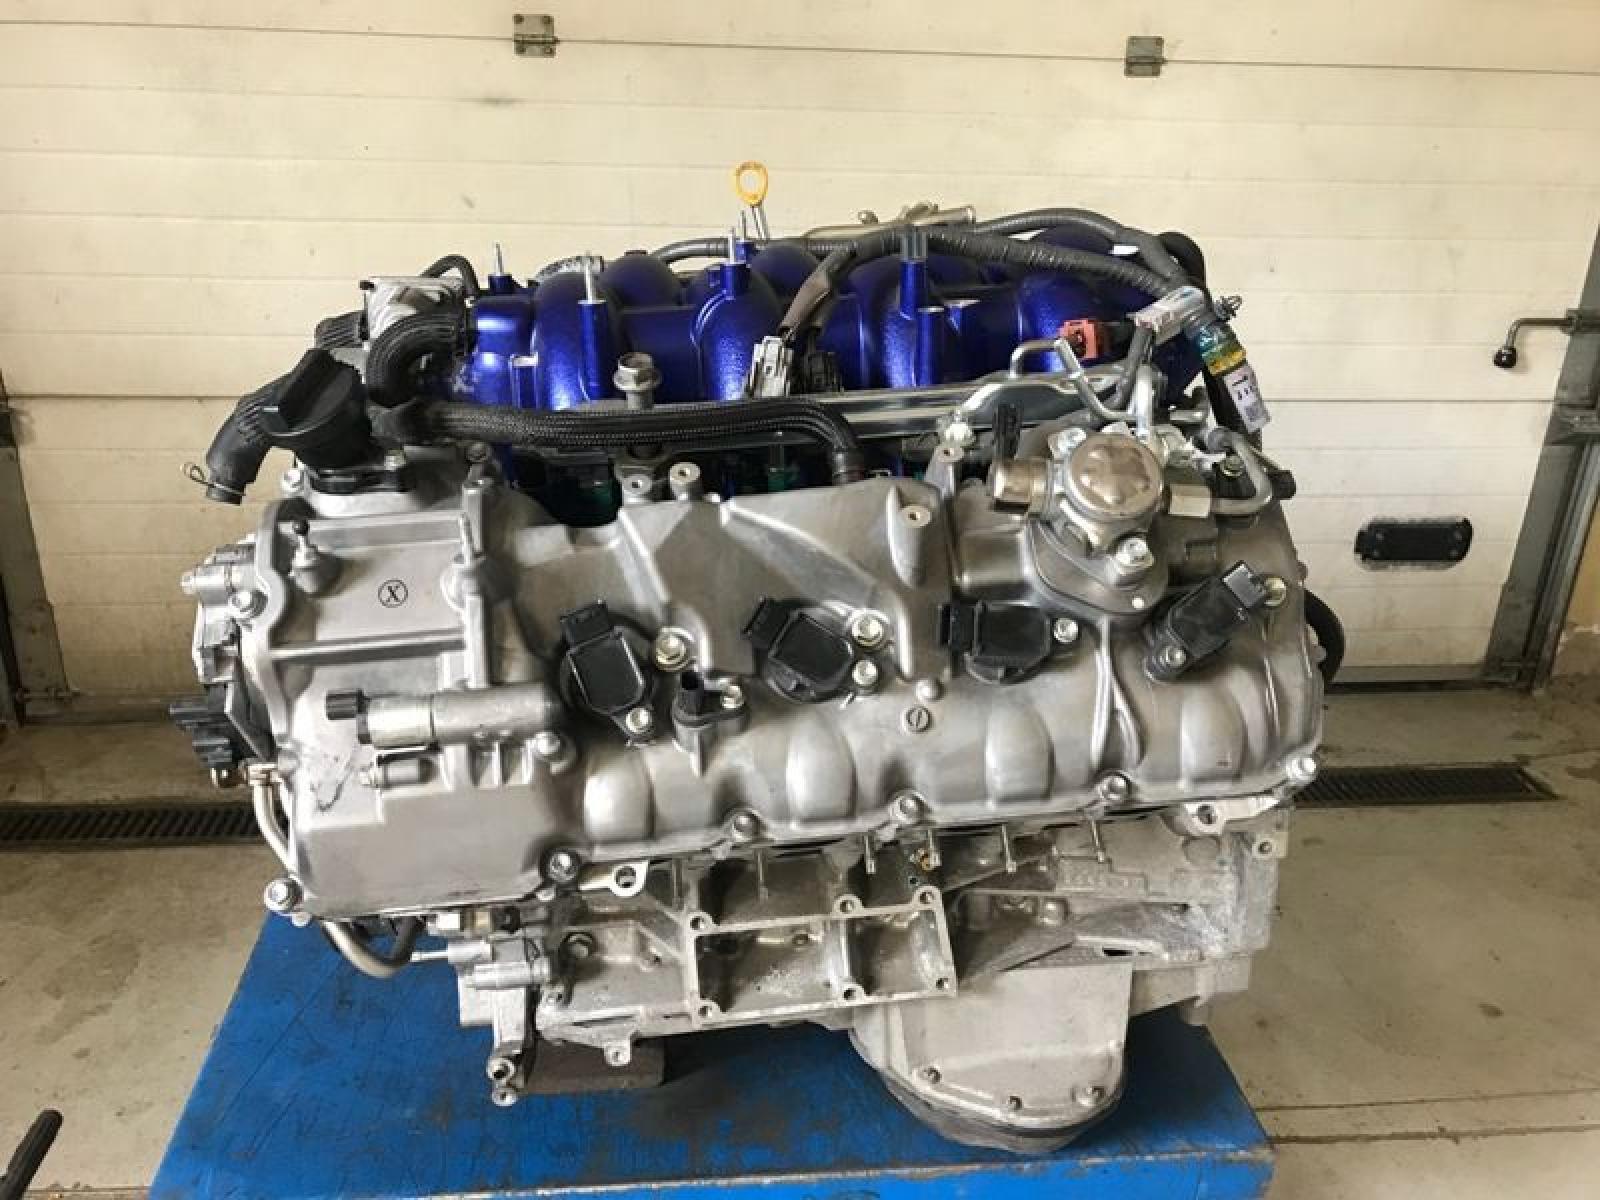 Rally Raid Toyota Hilux V8 engine for sale - 2